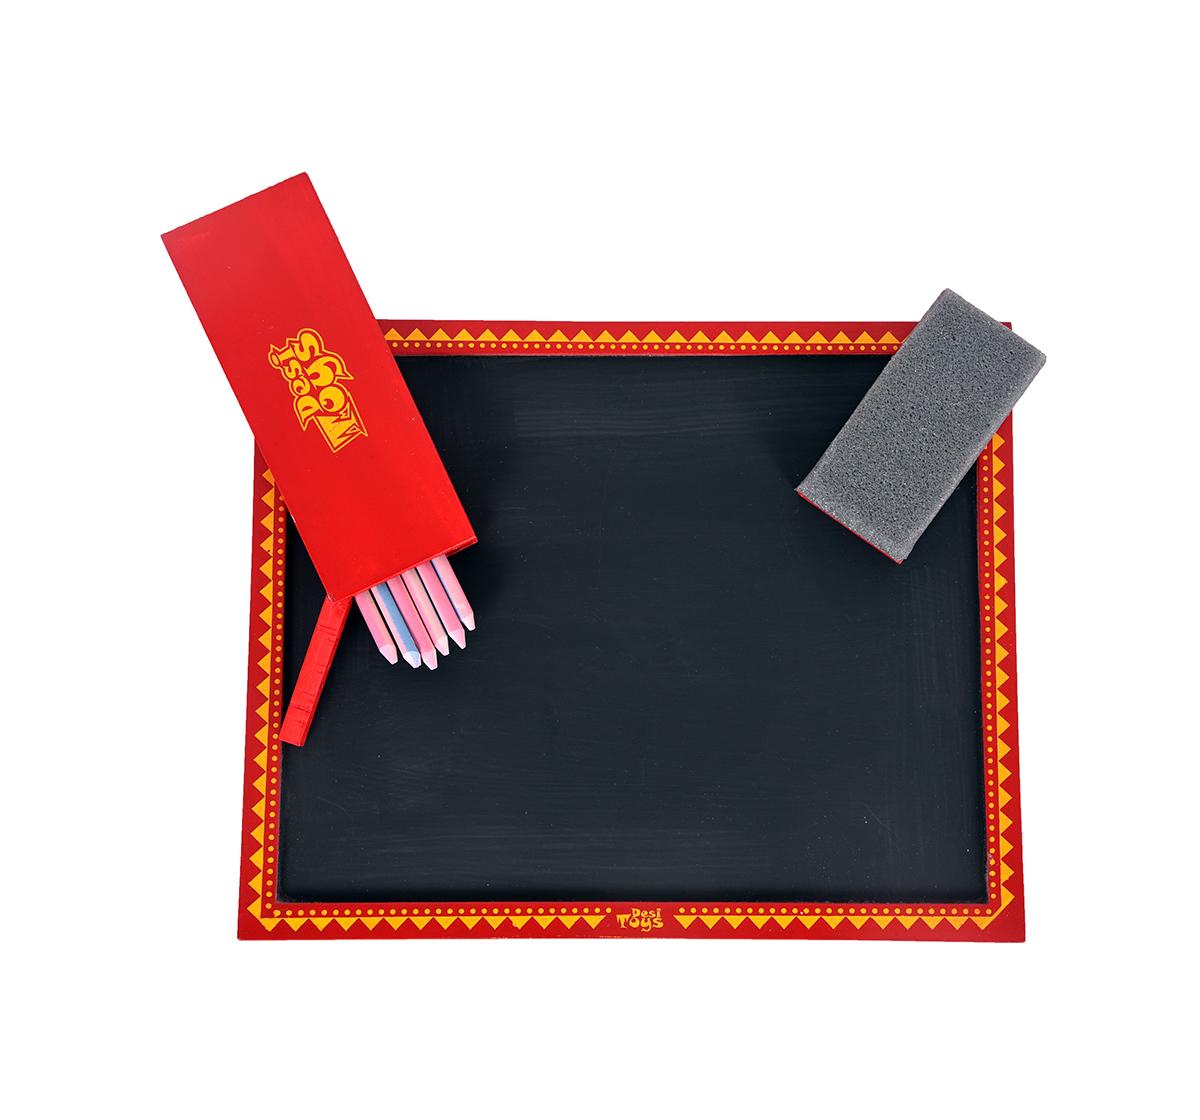 Desi Toys | Desi Toys Wooden Slate for Kids age 3Y+ - 1.2 Cm (Red)